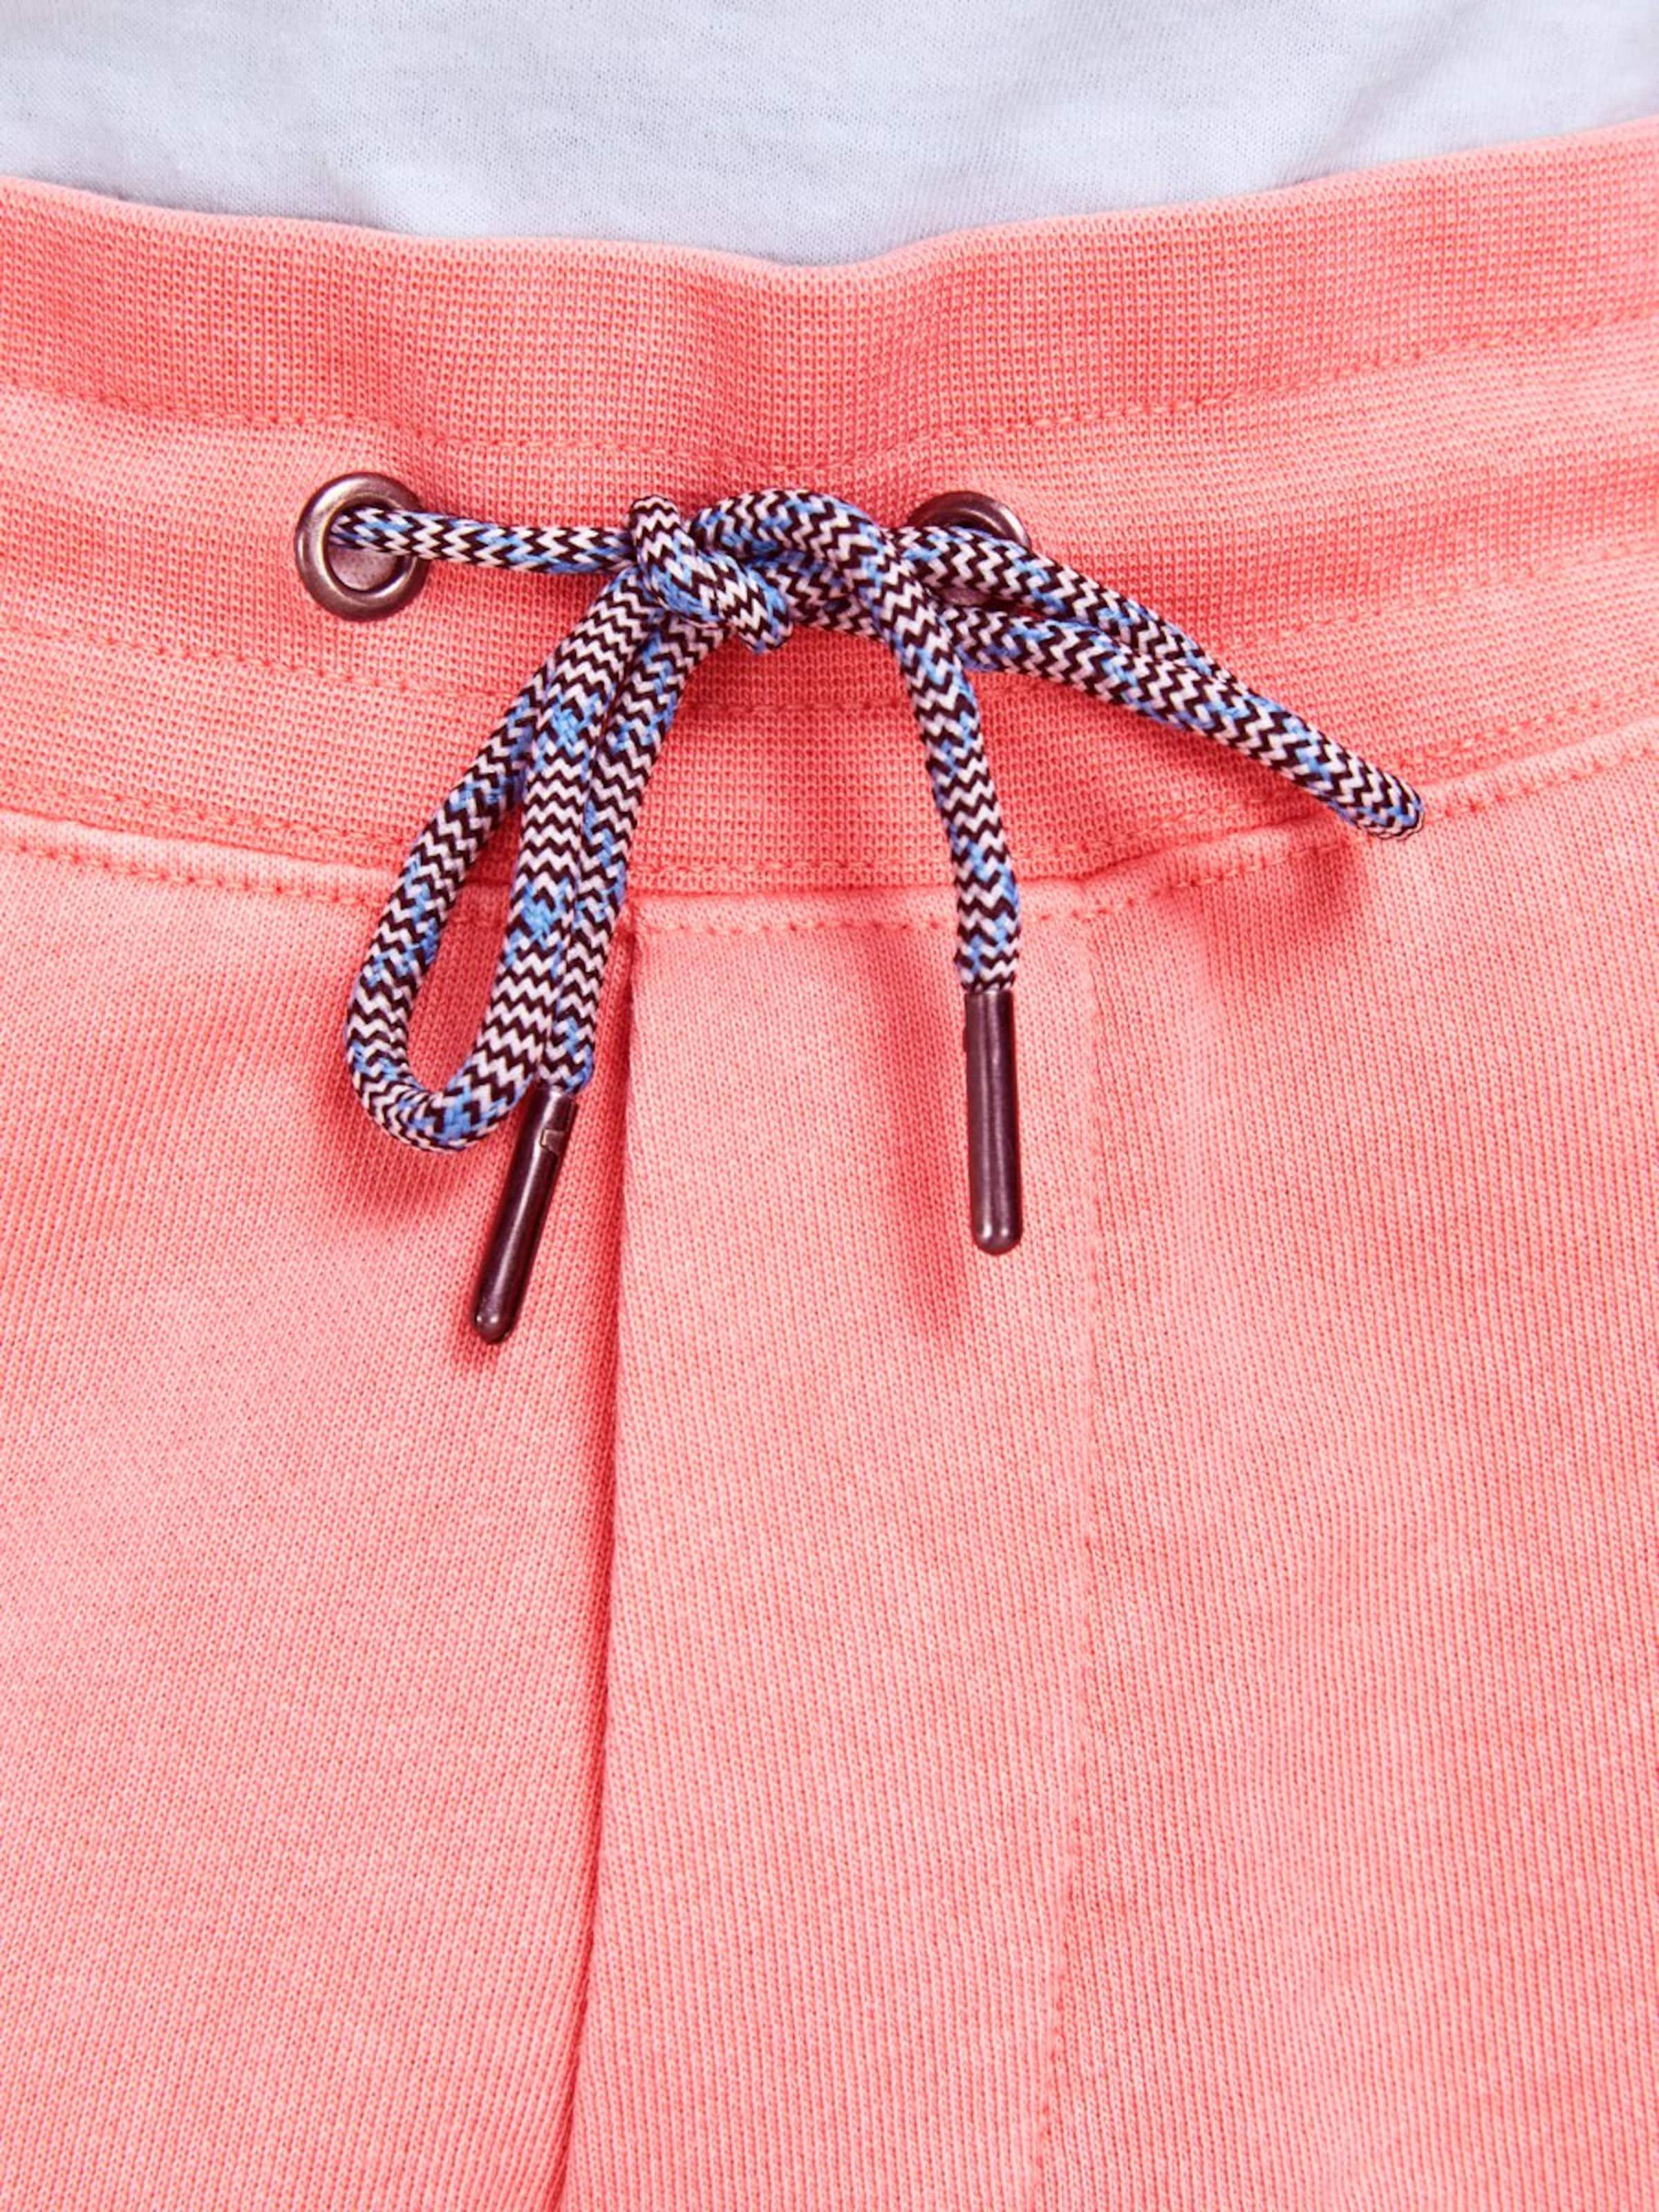 Pantalon Bleu Jones NuitCorail Jackamp; En UzMpqSVGL